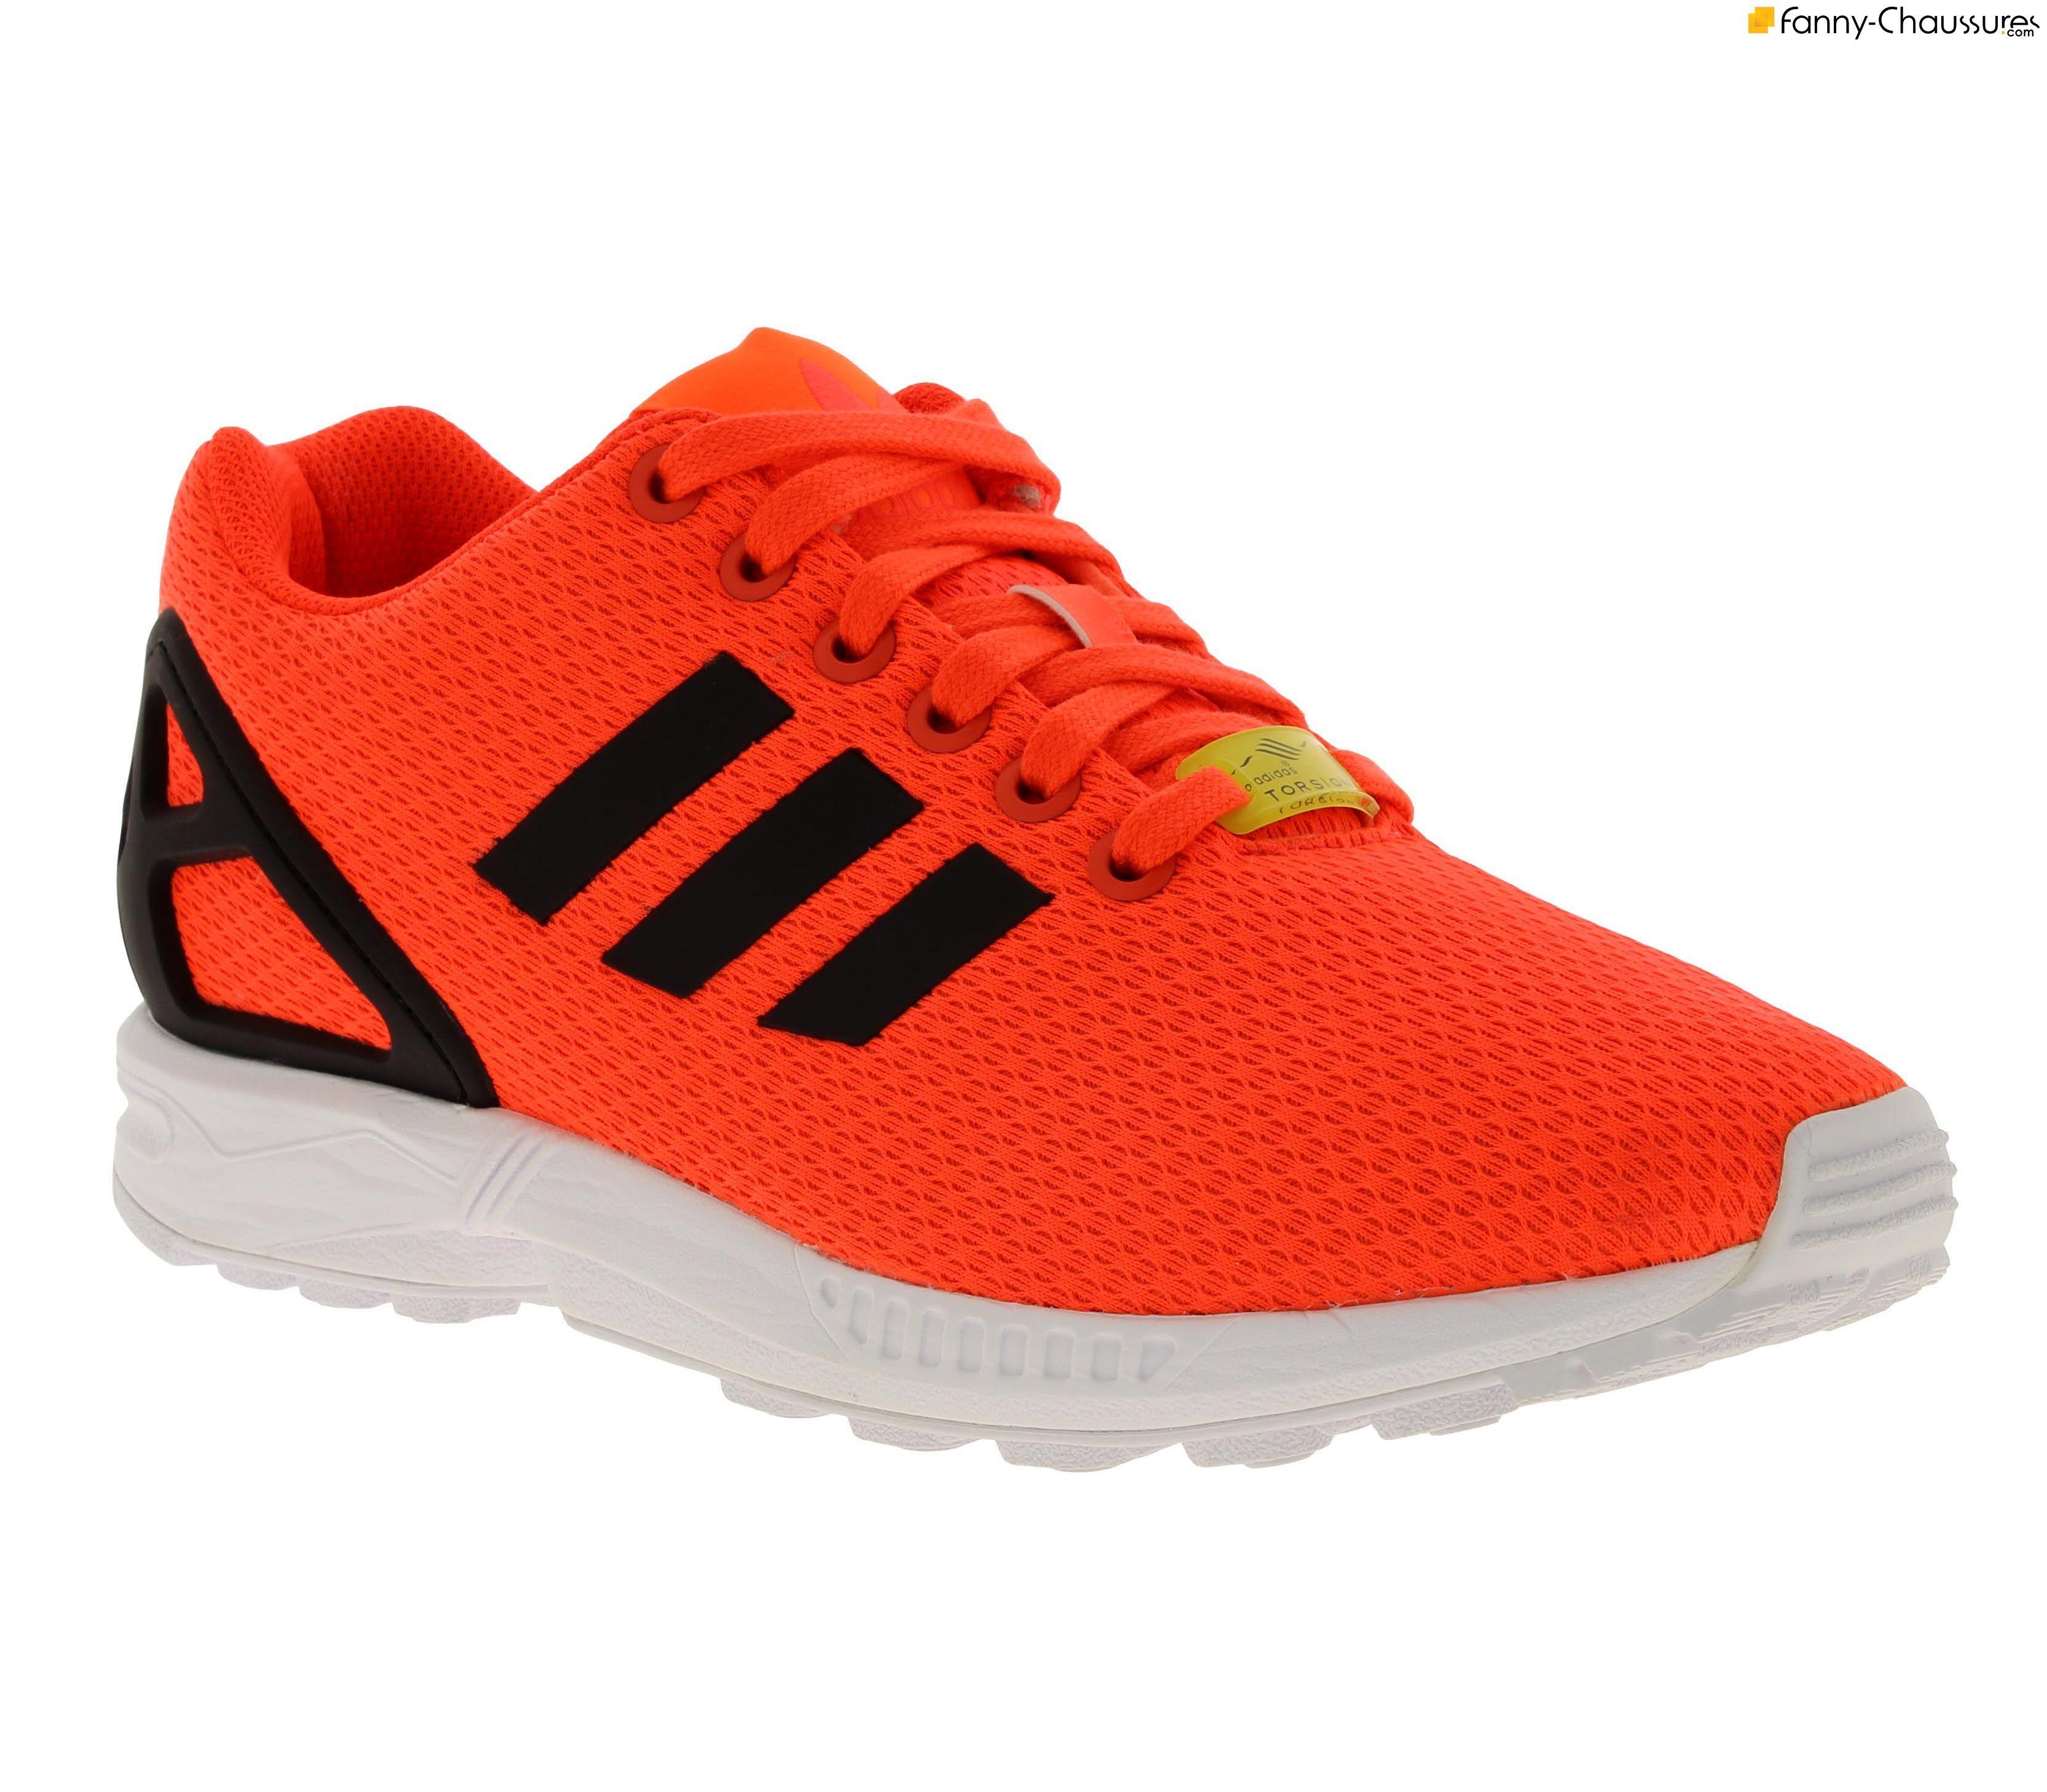 Chaussures Adidas | Chaussures adidas, Adidas et Modèle de ...